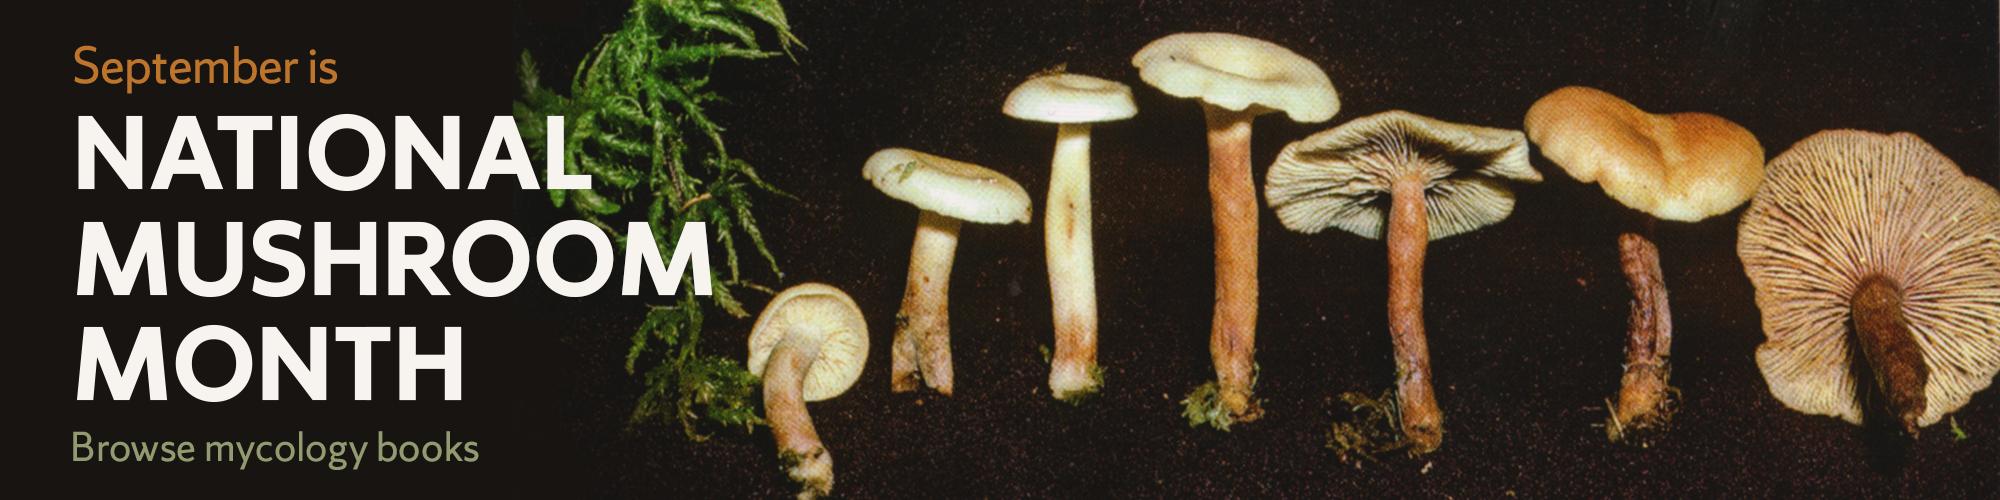 September is National Mushroom Mouth